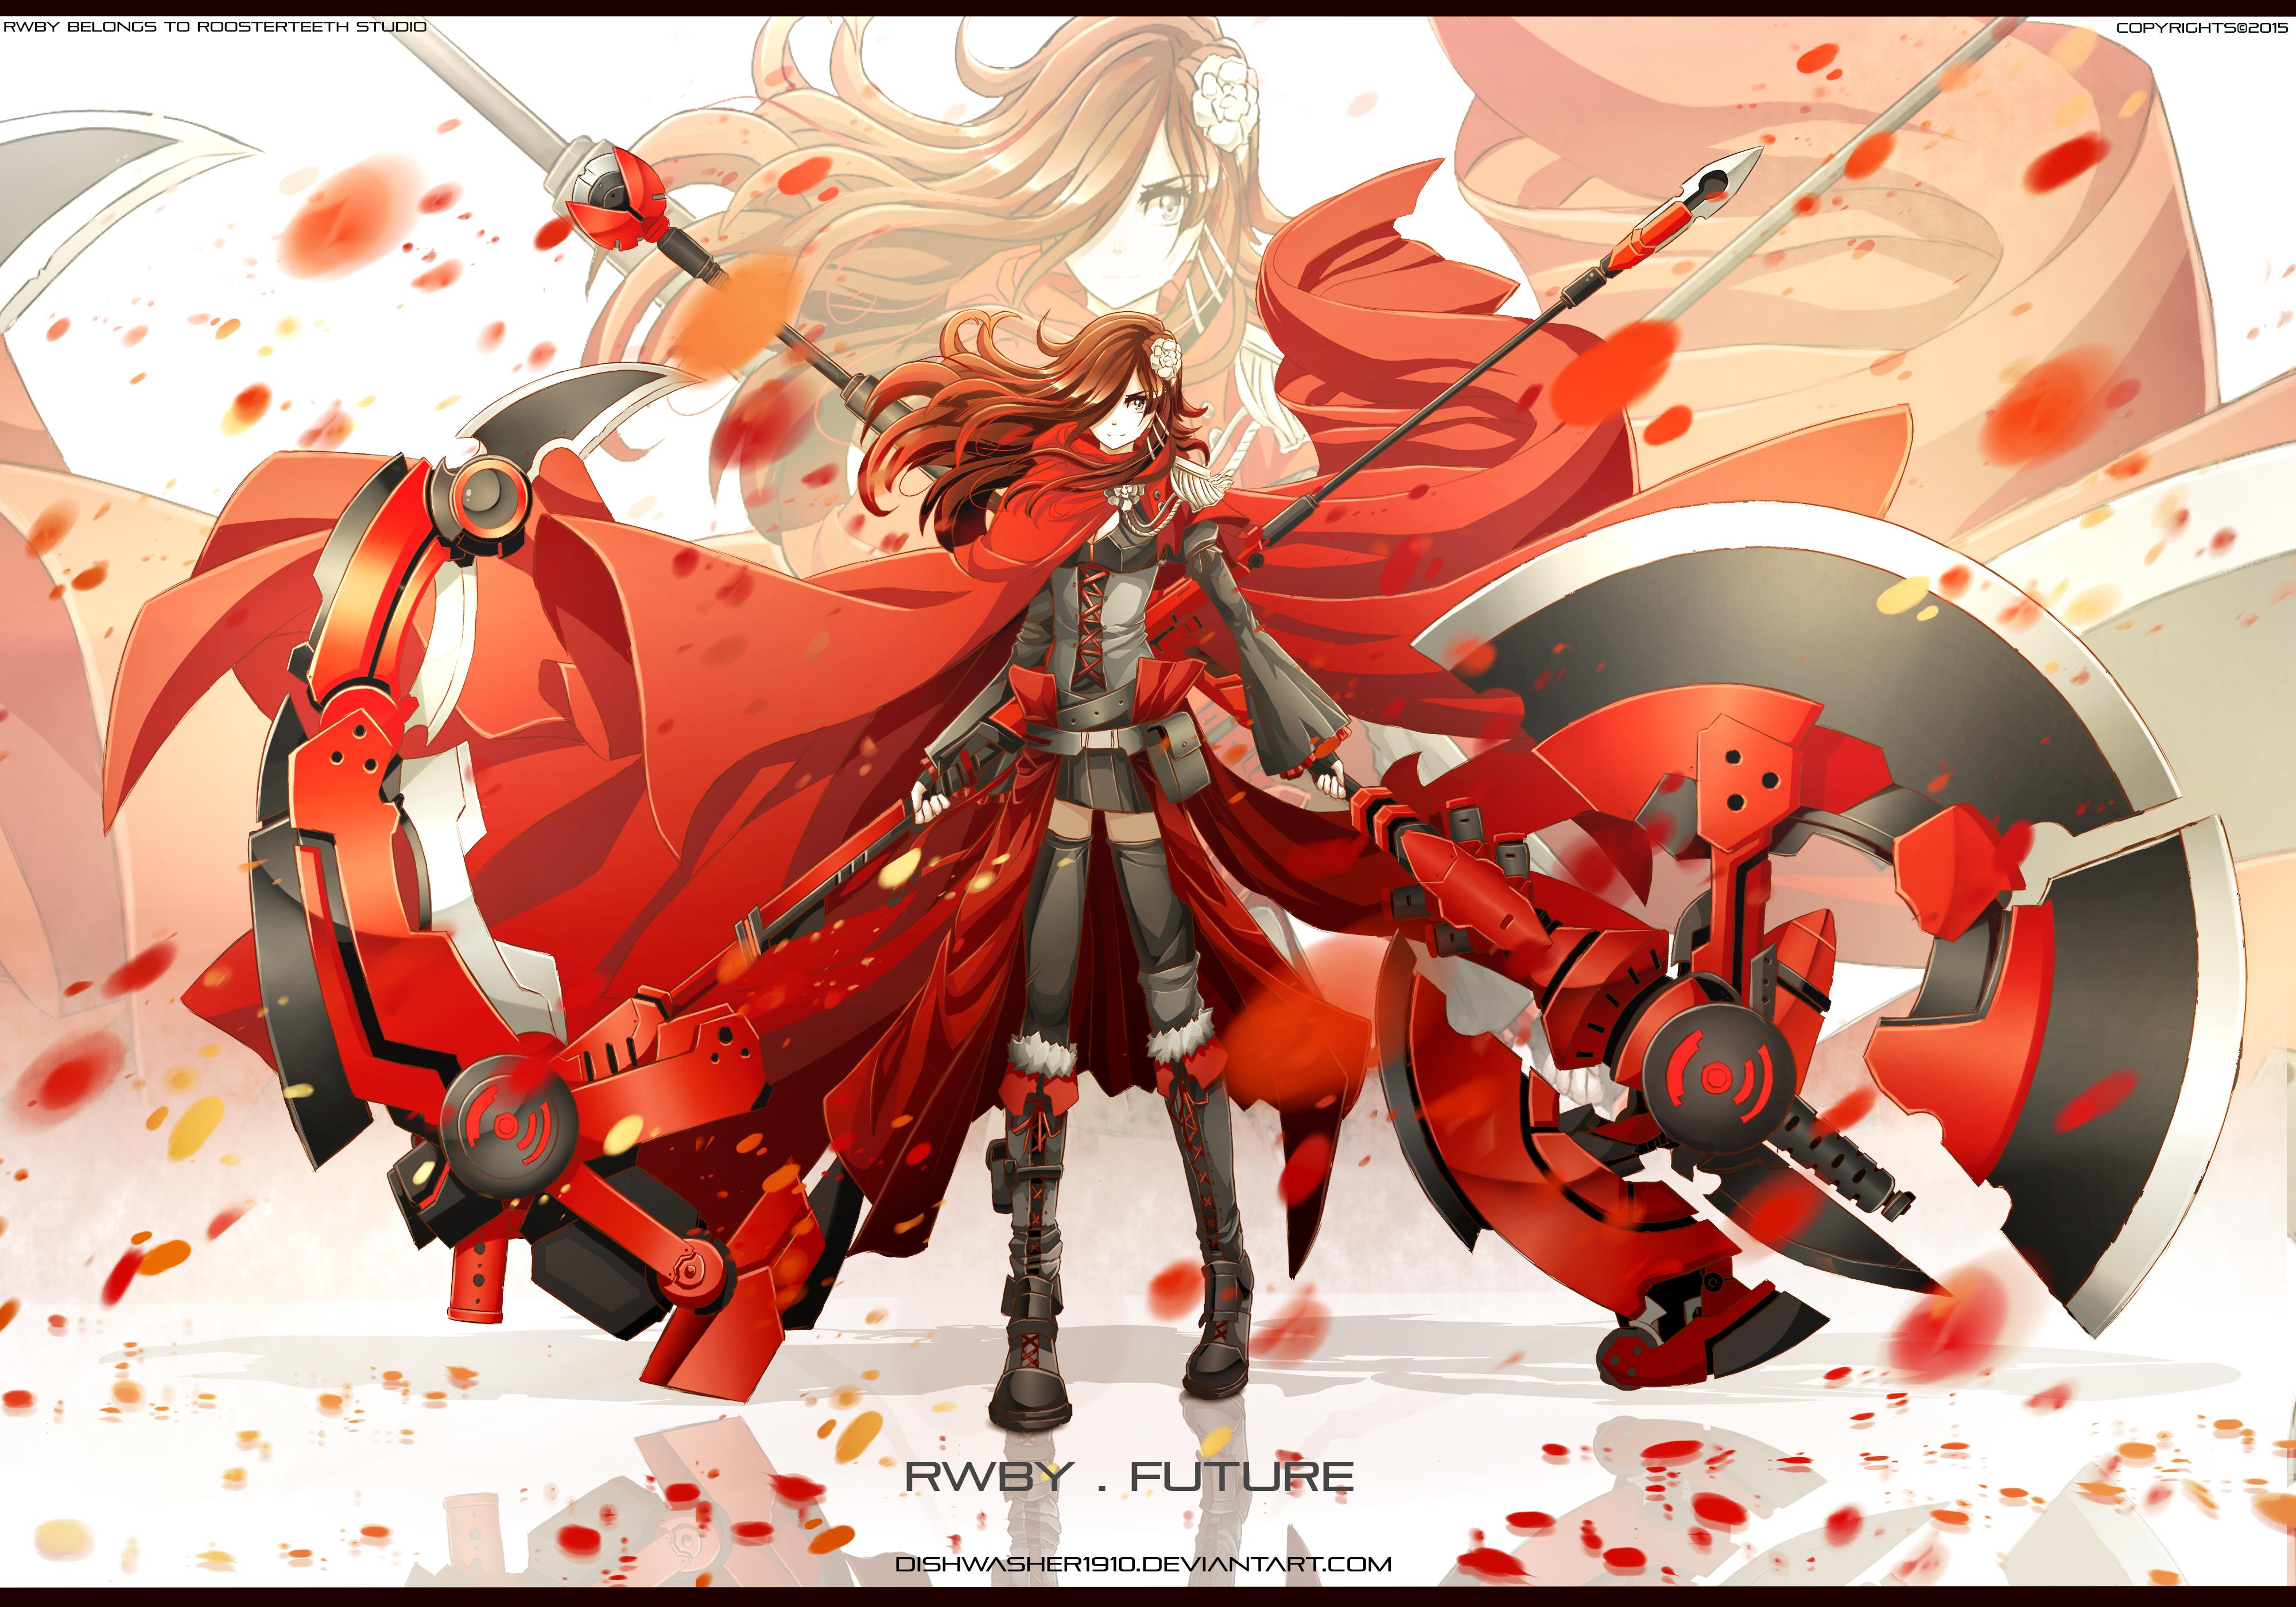 Ruby rose rwby image 1901469 zerochan anime image board - Rwby ruby rose fanart ...